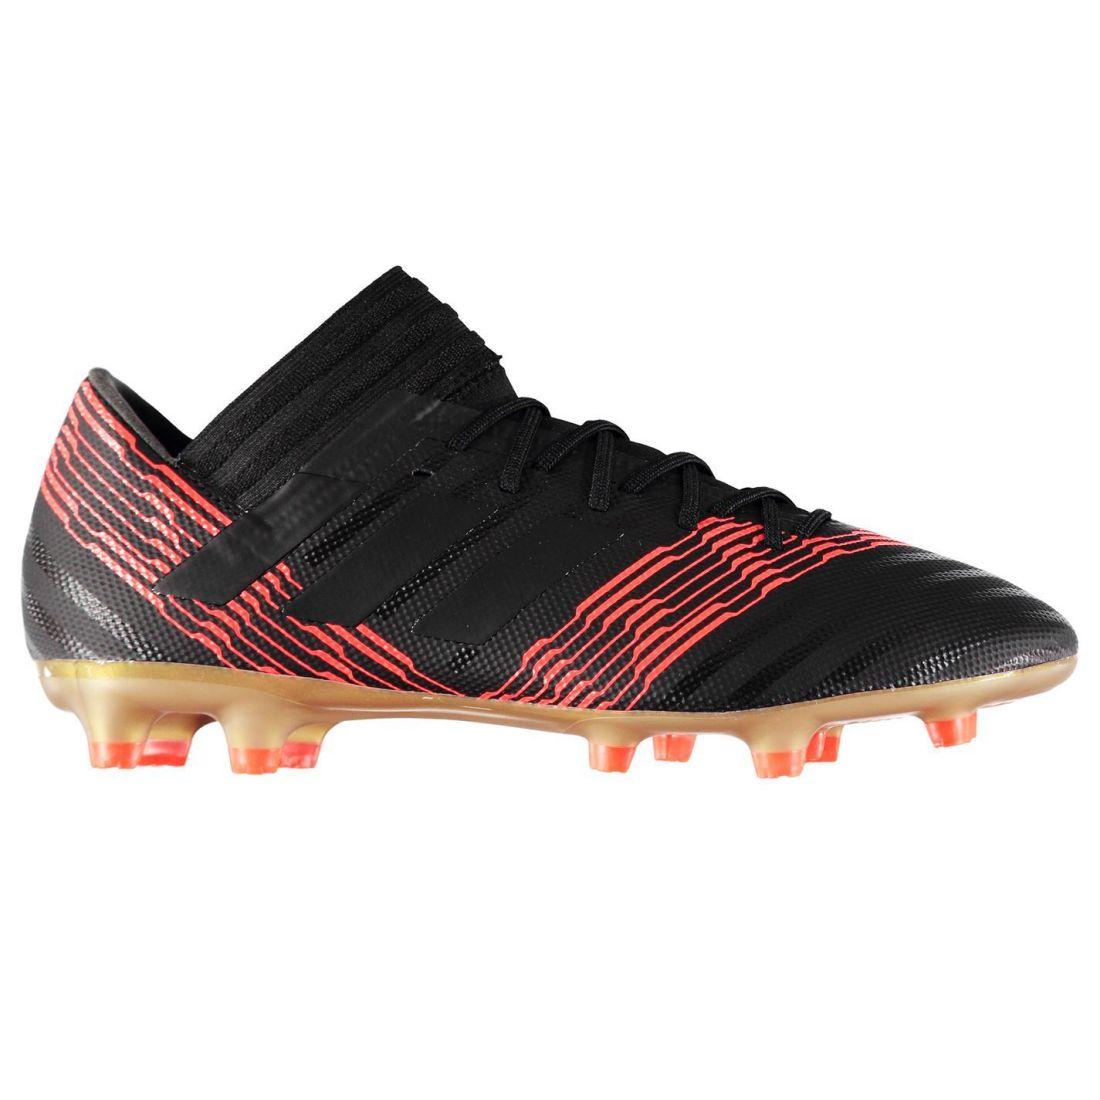 adidas Mens Nemeziz 17.3 FG Football Boots Firm Ground Lace Up Mesh ... 8ff8f0aee47